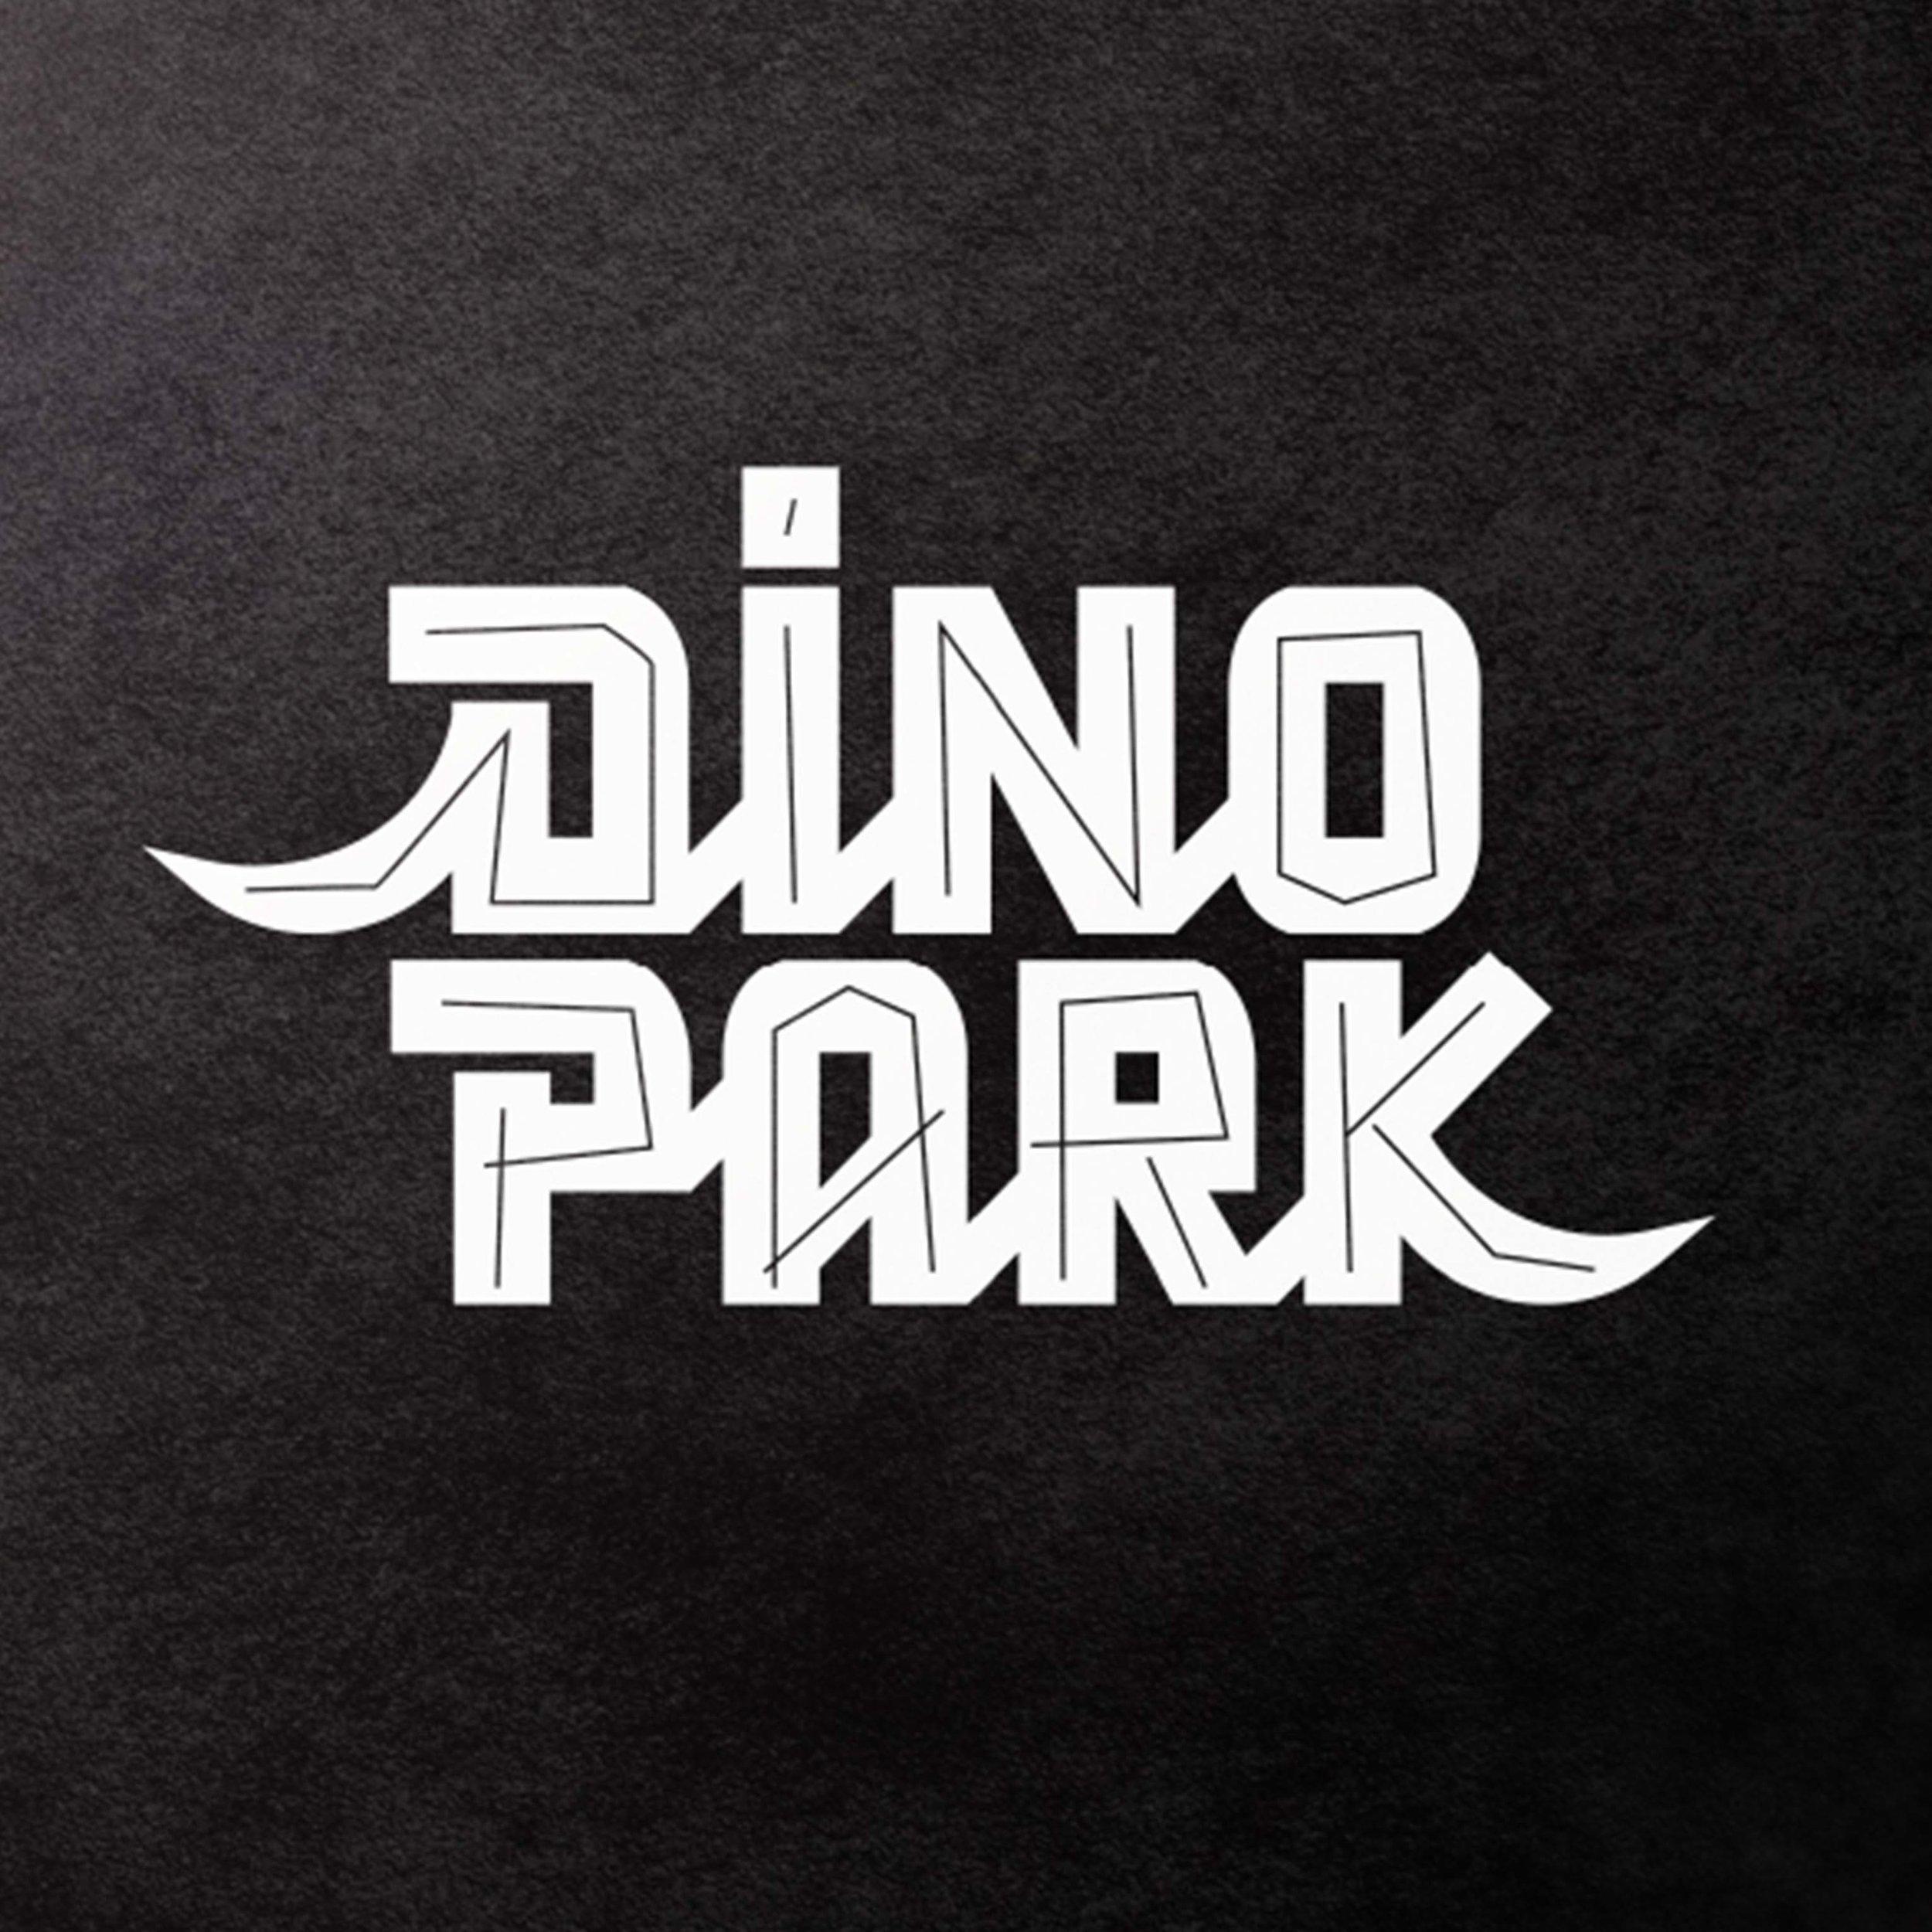 LETTERING-Typography-Dino-Park.jpg